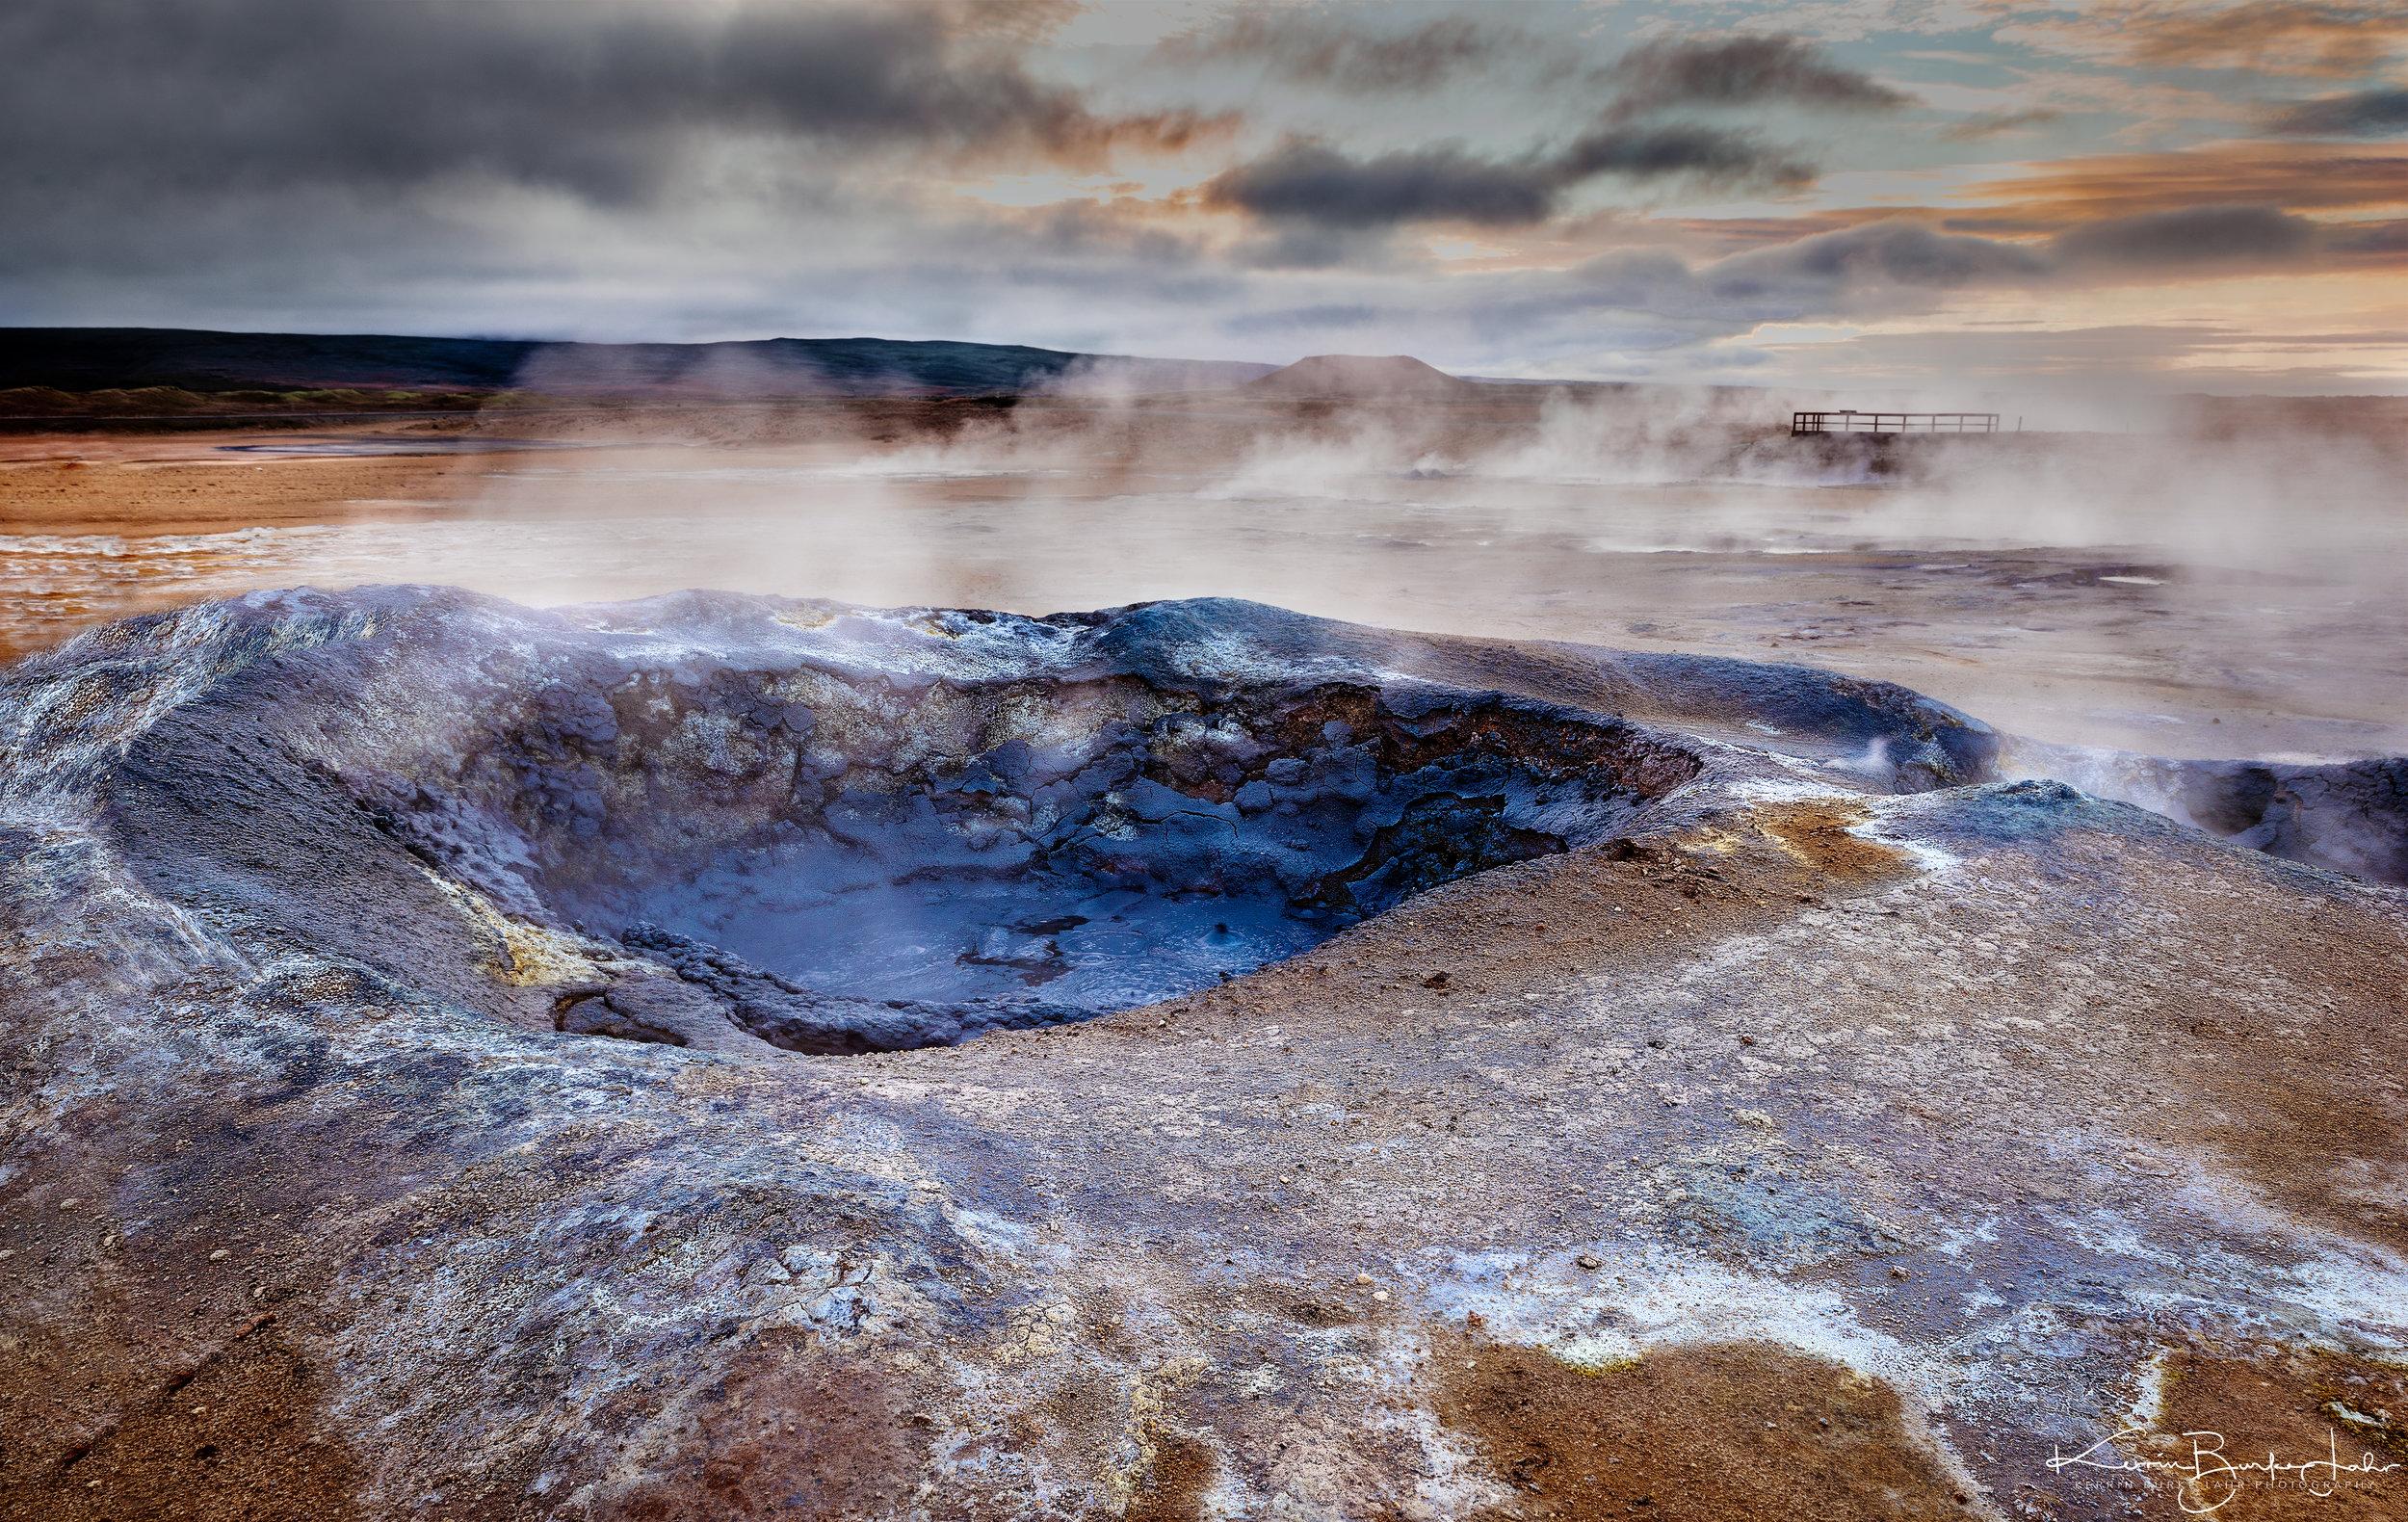 Iceland-Day-4-afternoon-16-myvatn-mud-pots.jpg